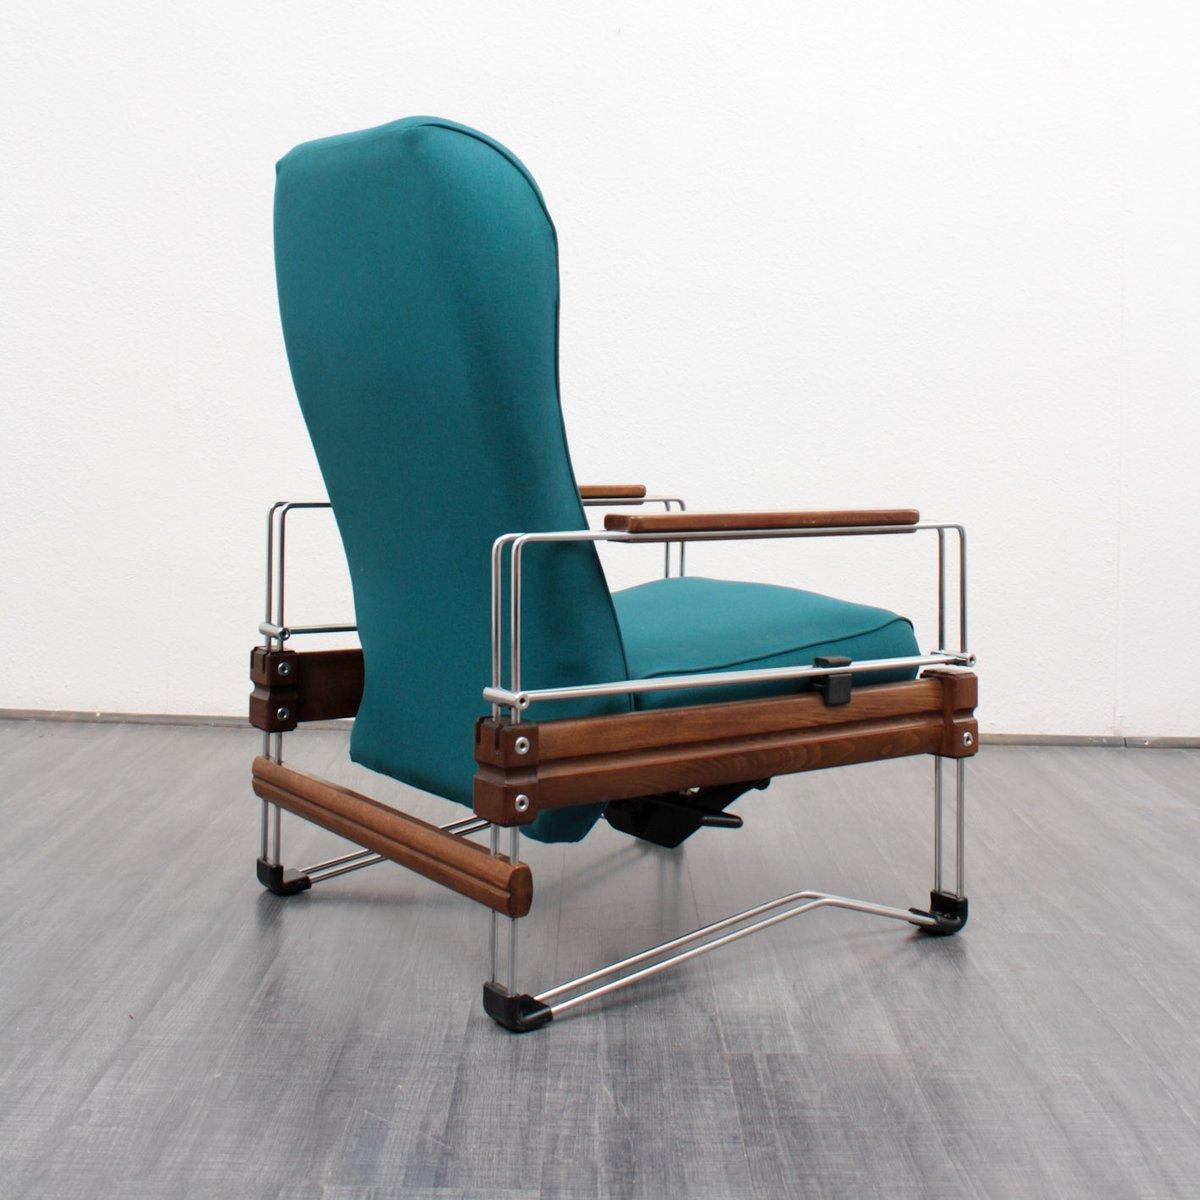 vintage lounge sessel aus holz mit verchromten gestell bei. Black Bedroom Furniture Sets. Home Design Ideas